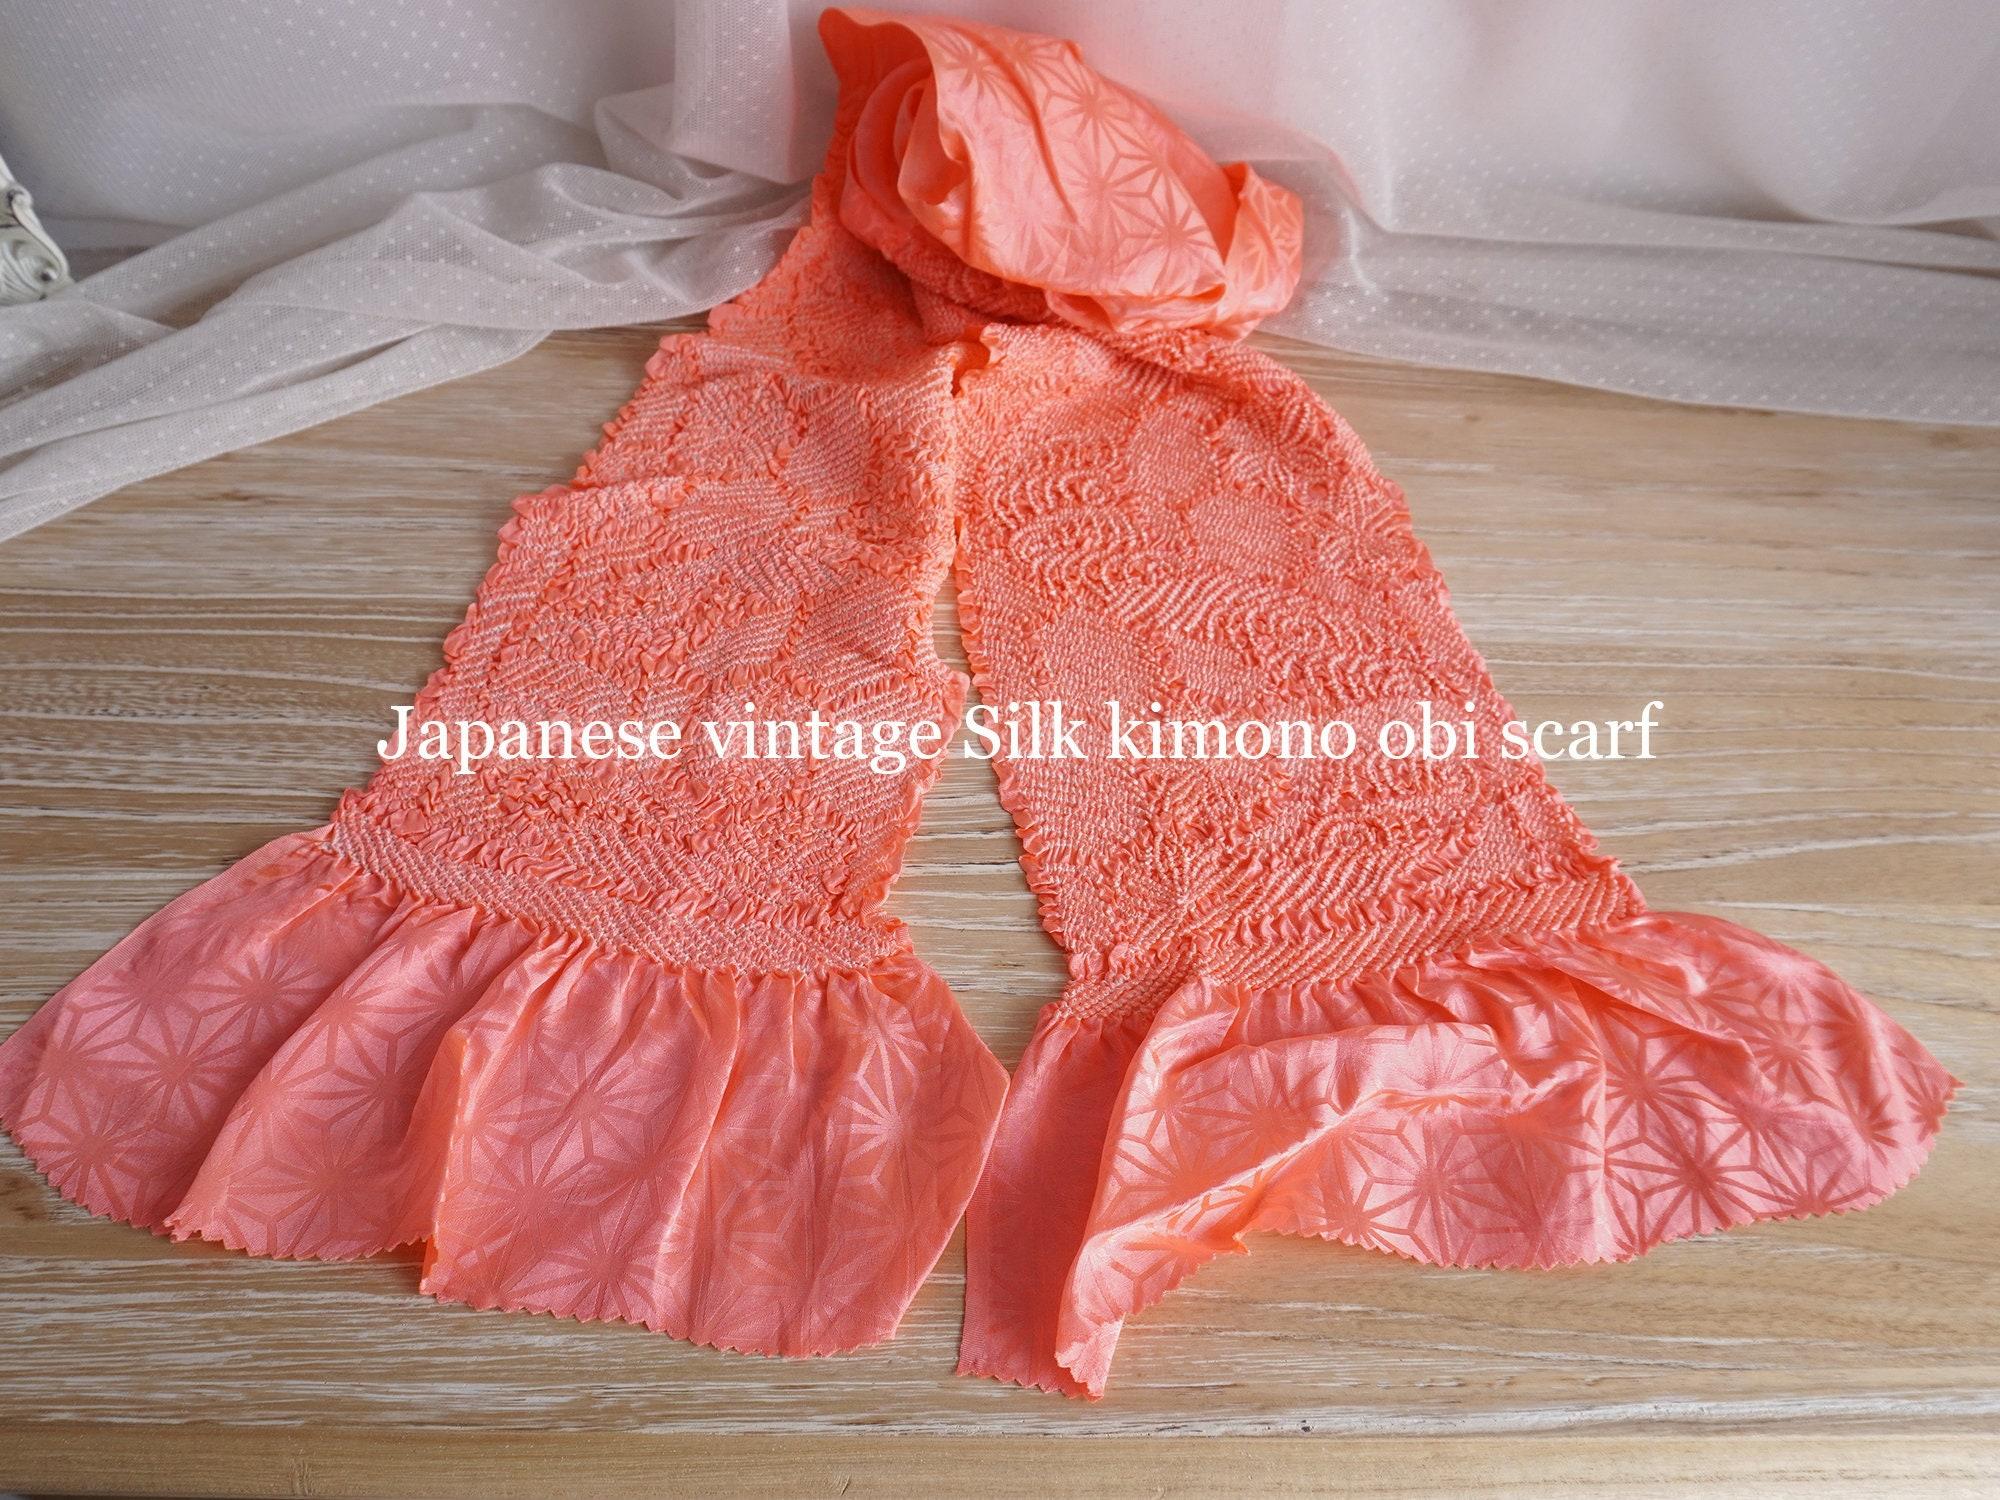 Vintage Scarf Styles -1920s to 1960s Japanese Vintage Silk Kimono Obi Scarf Coral Pink $40.00 AT vintagedancer.com